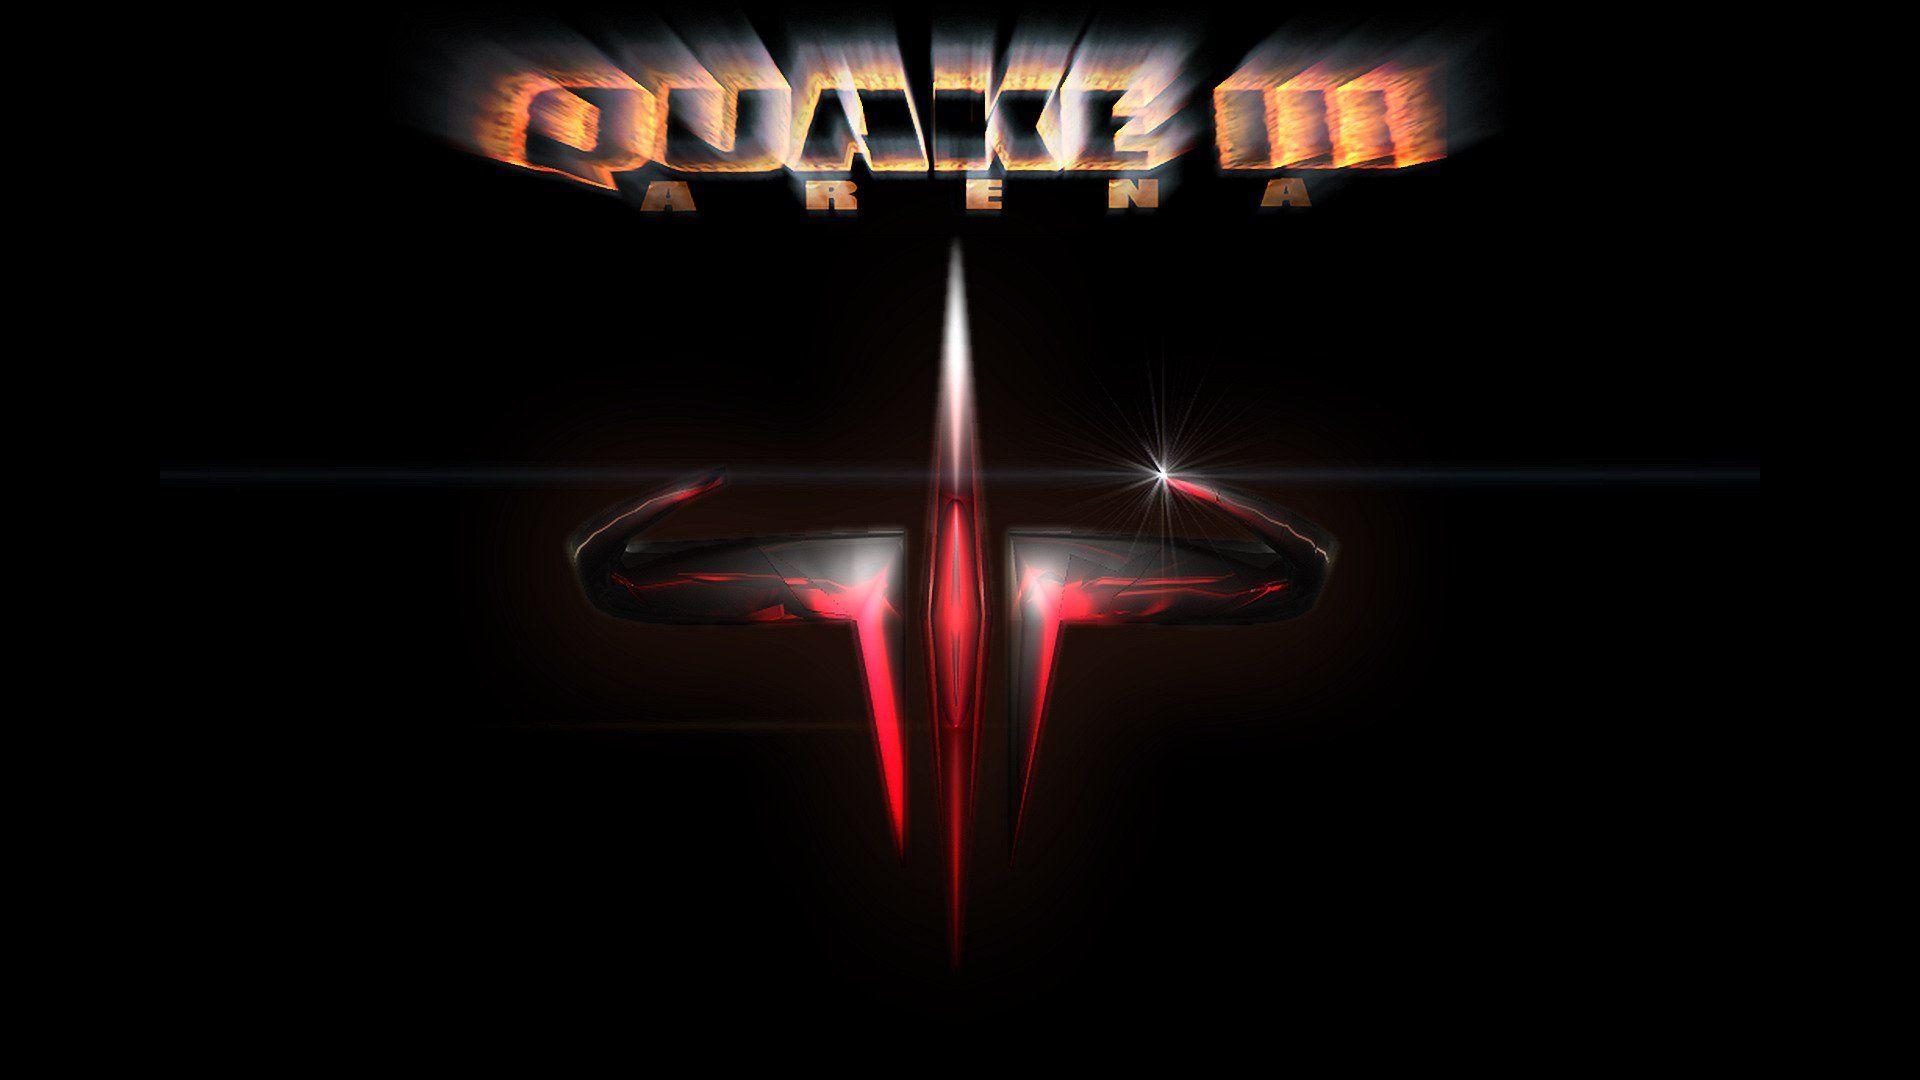 Rip Mod Hq Mod, Quake Iii Arena, Total Conversion, Addon, Development